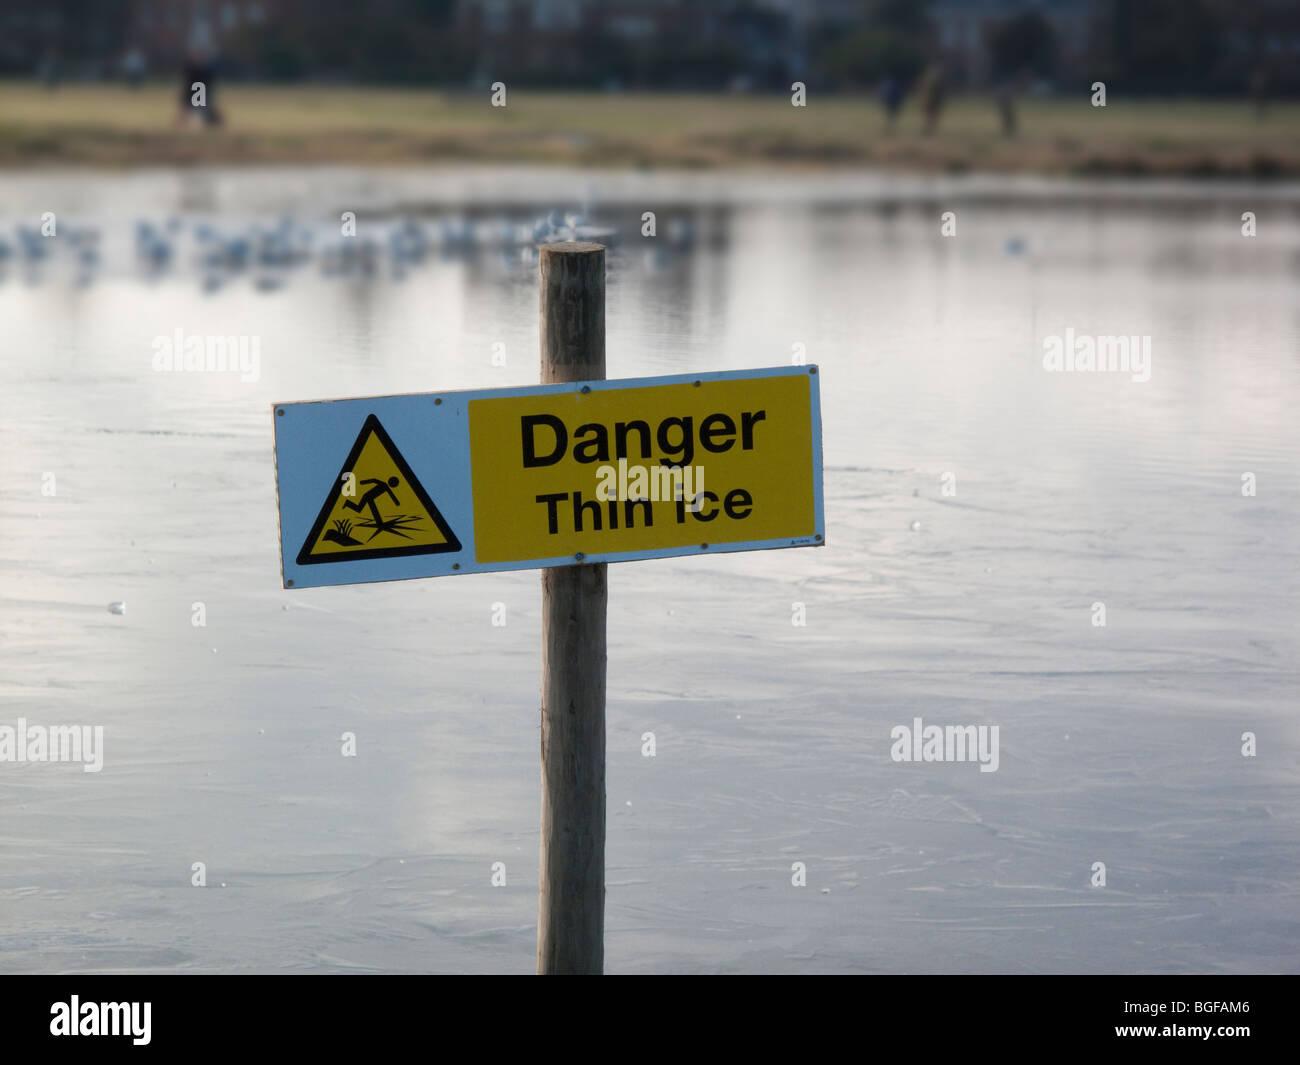 Danger, thin ice, signpost on frozen pond, Wimbledon Common, London - Stock Image